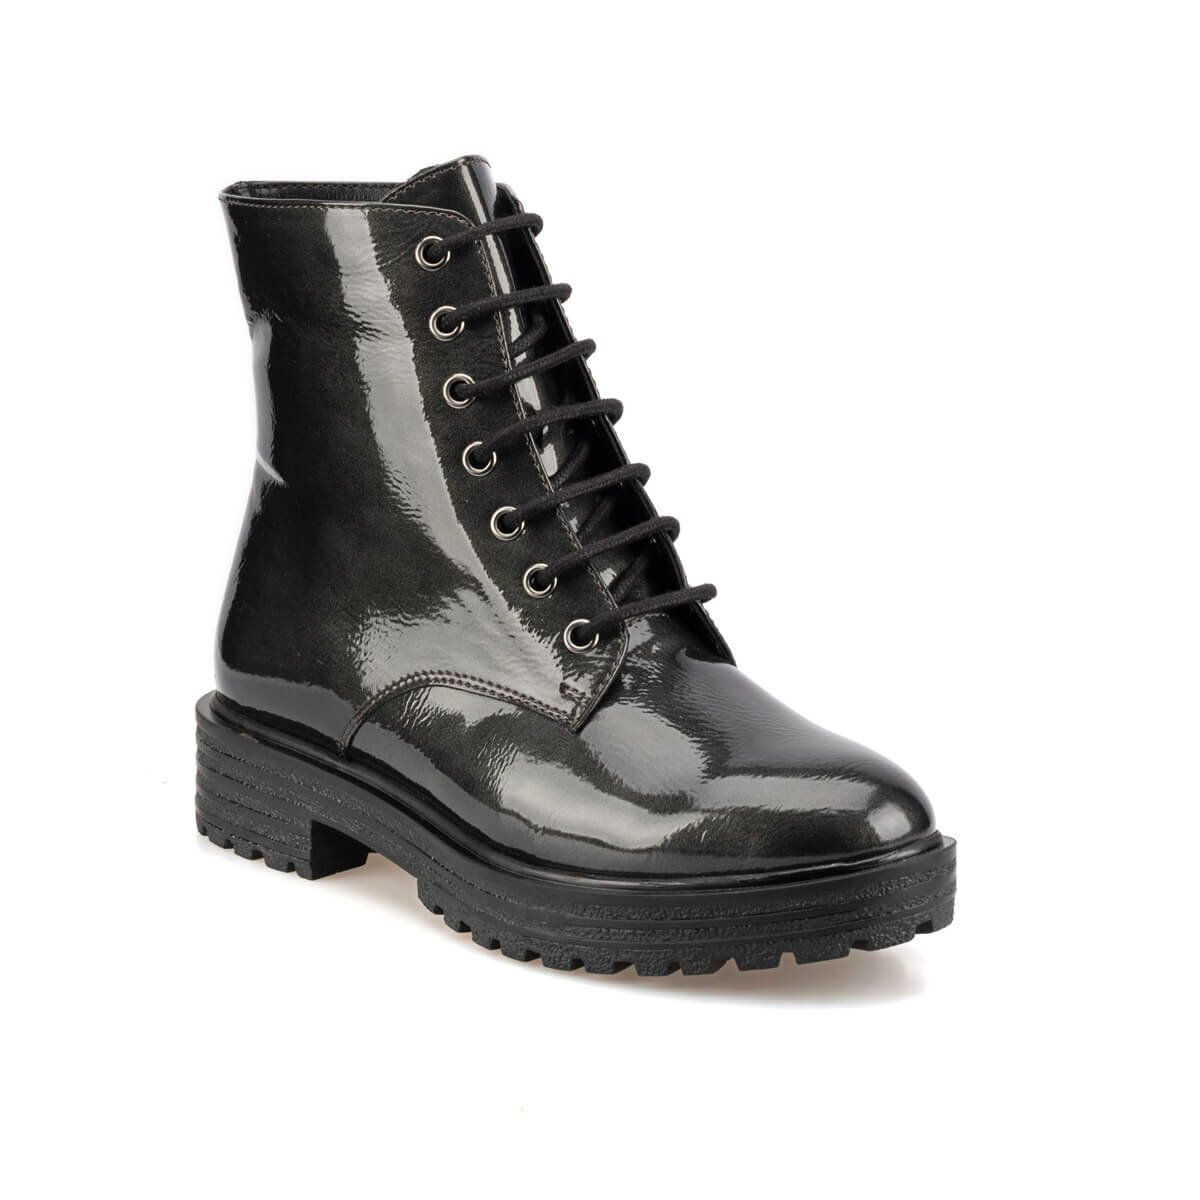 FLO 92.314613.Z STEEL Women Boots Polaris